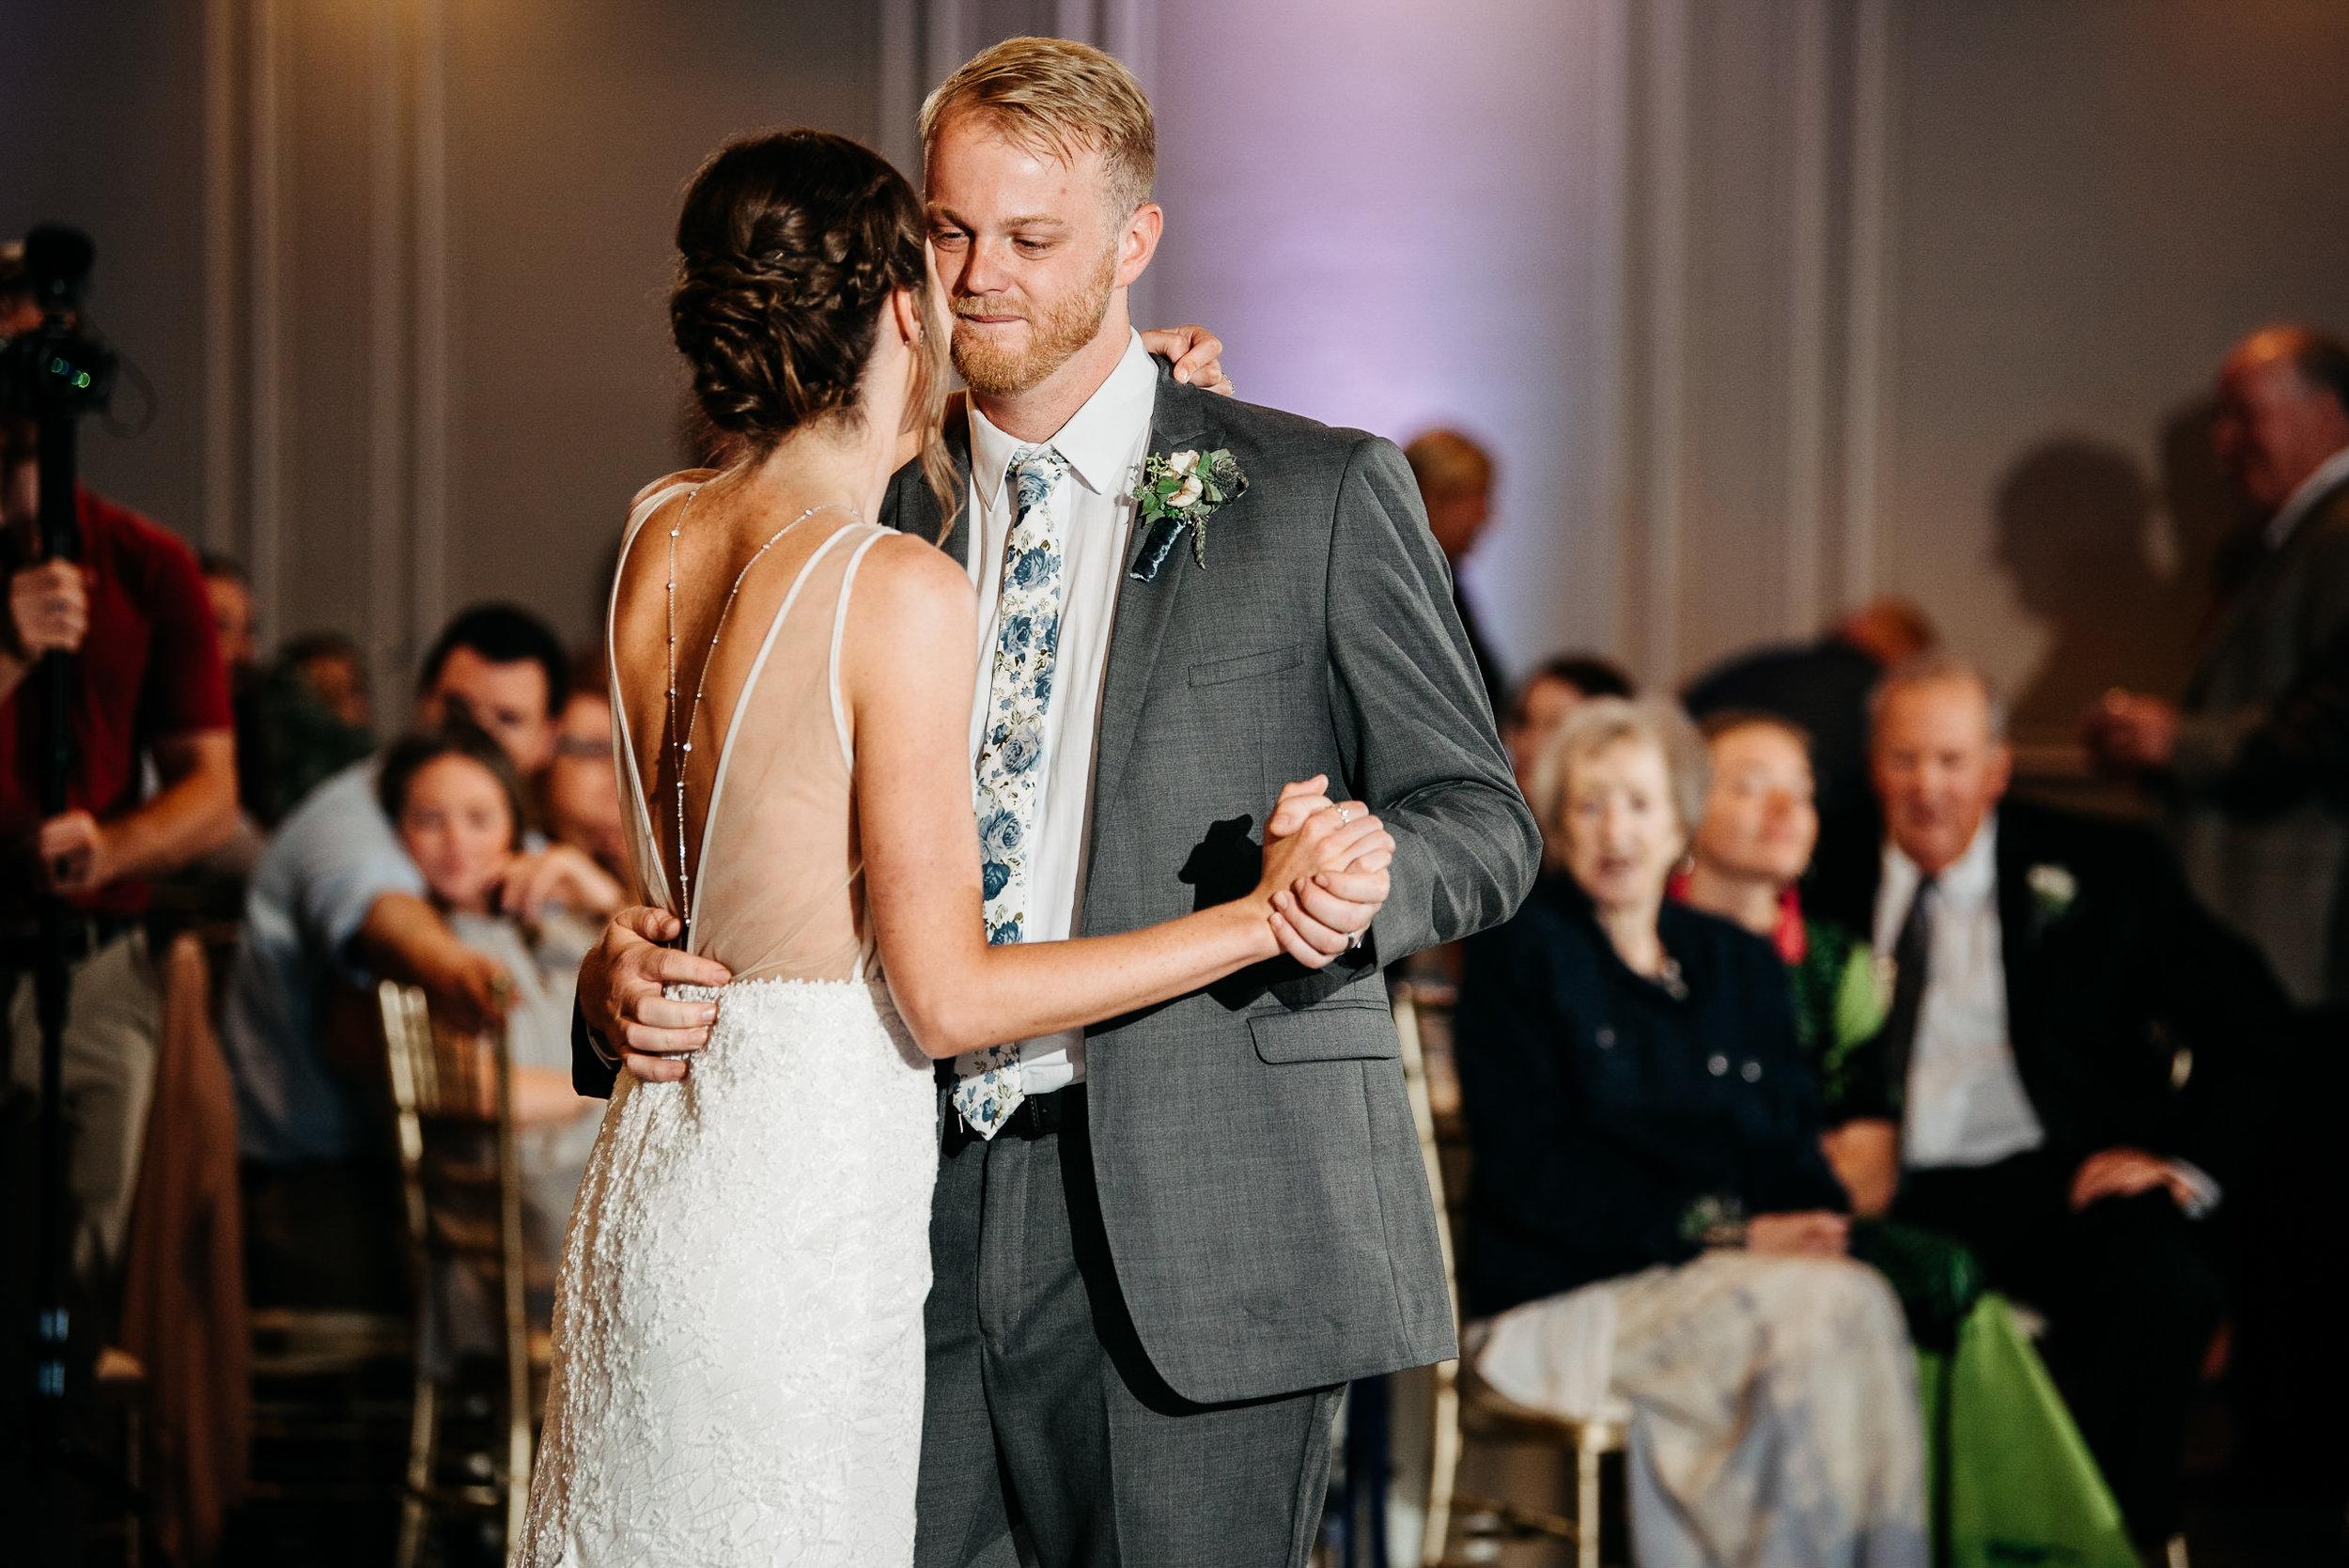 okc-wedding-photographer-coles-garden-wedding-okc-best-wedding-photographers-174.jpg